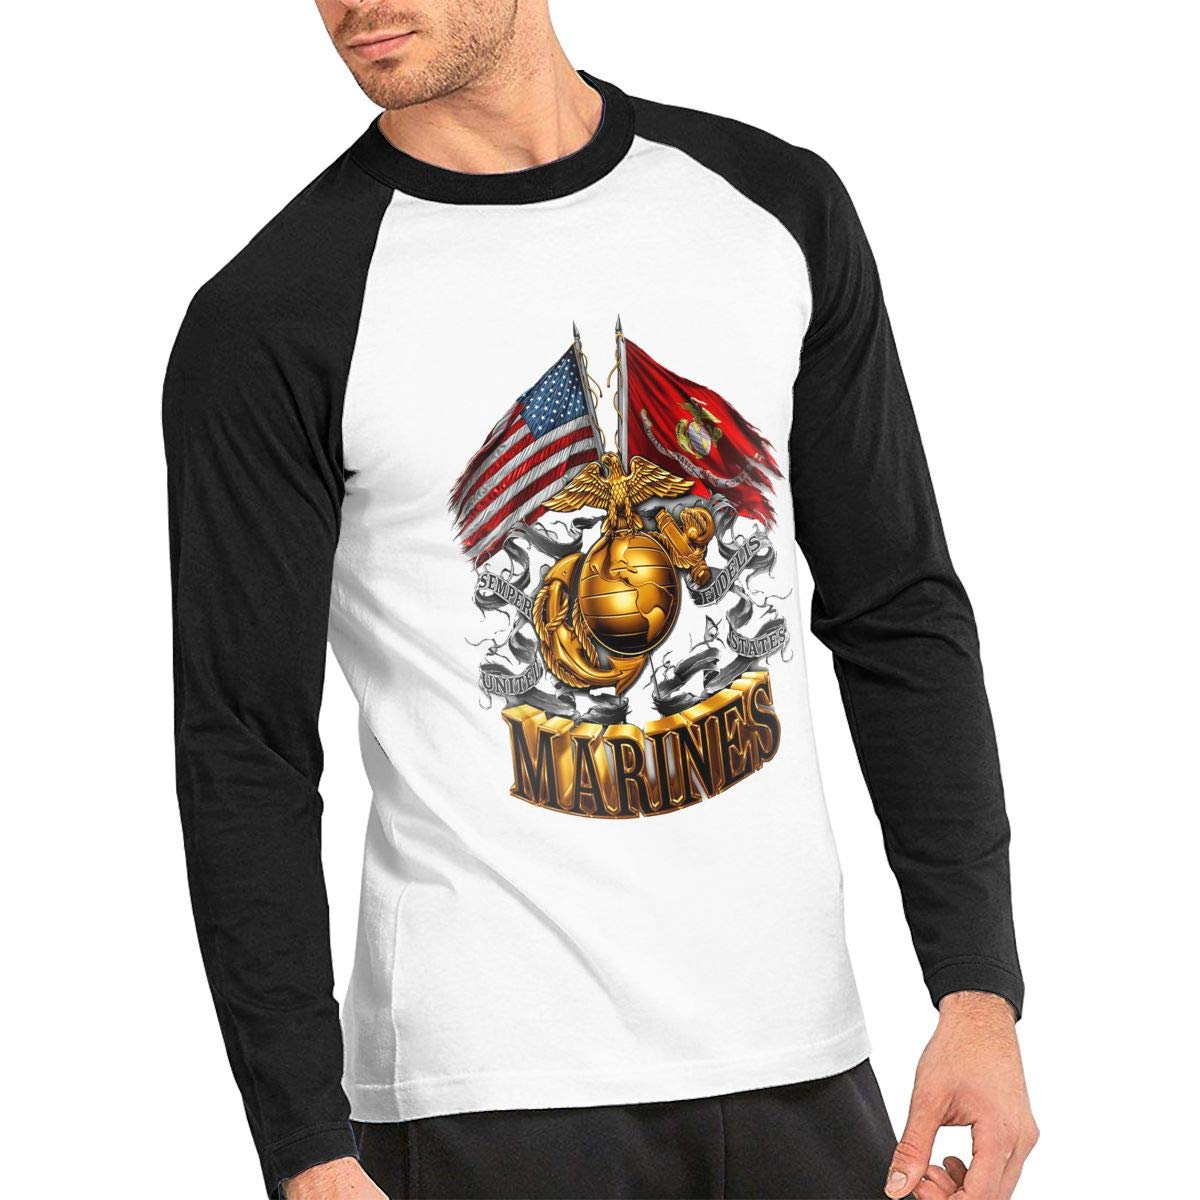 Marine Corps Gold Globe Patriotic Male Long Sleeves Tees Crew Neck Baseball Tees Raglan T-Shirt